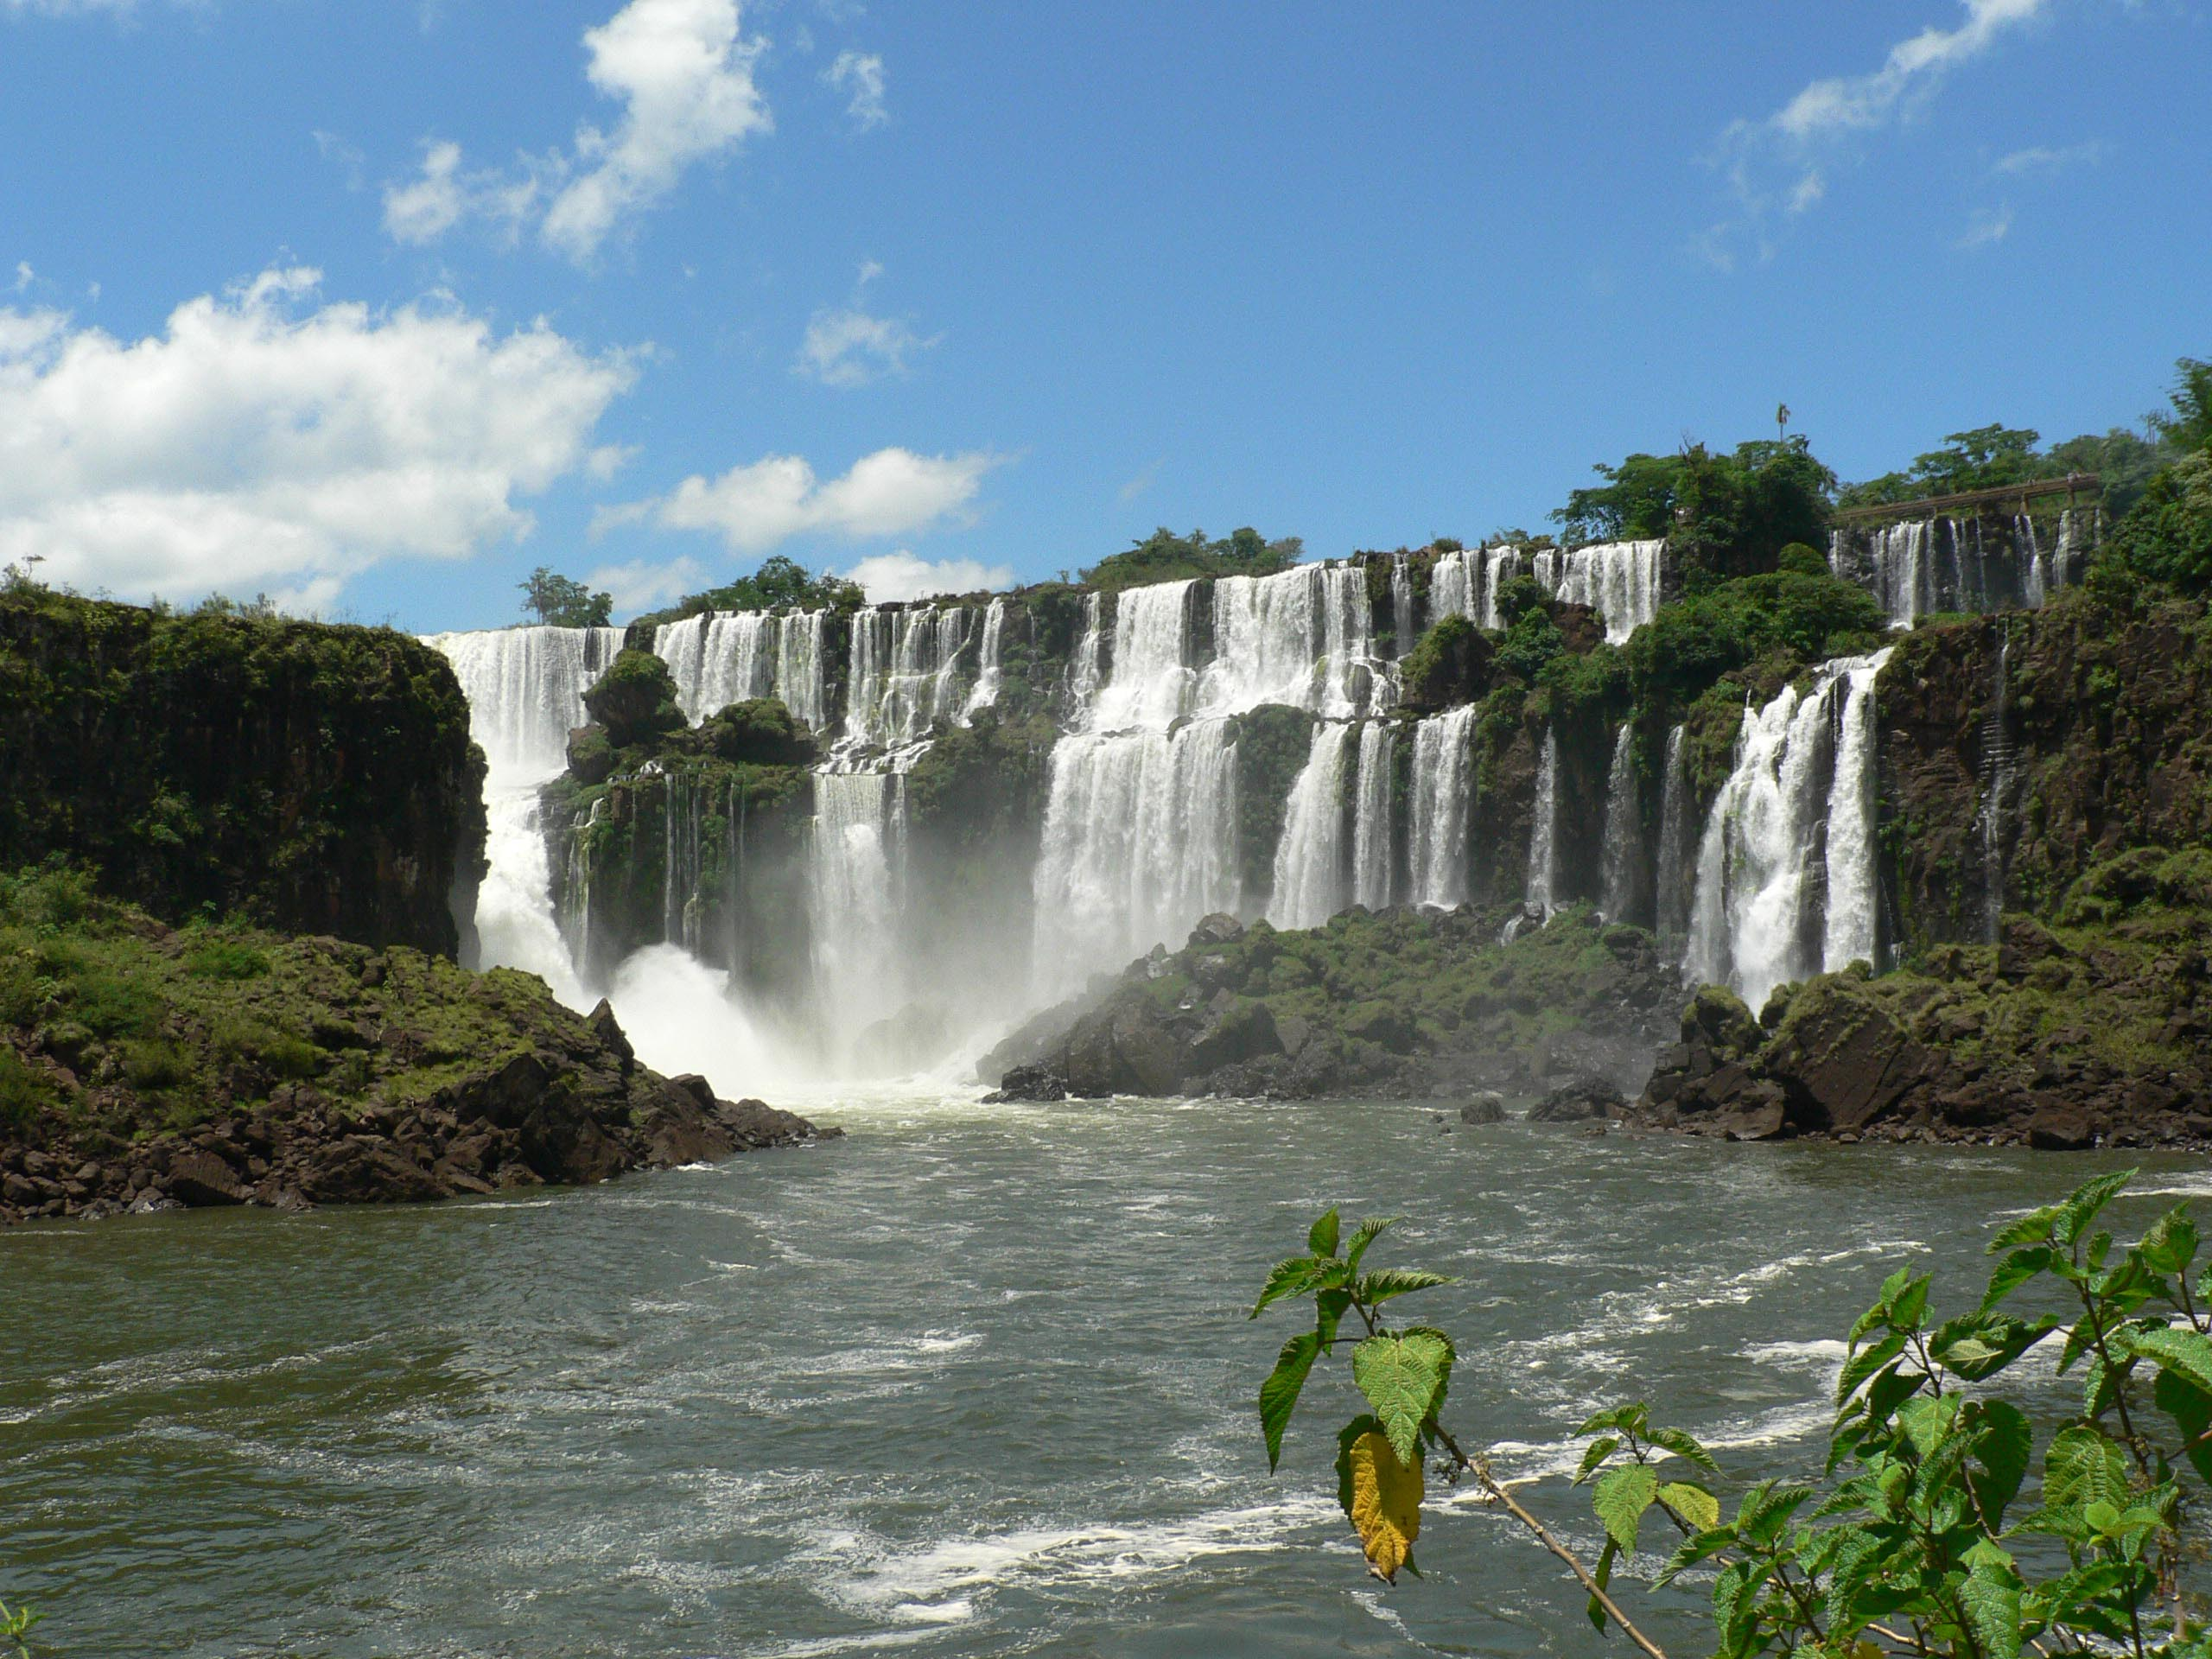 Iguazu Falls Experience - Independent 1